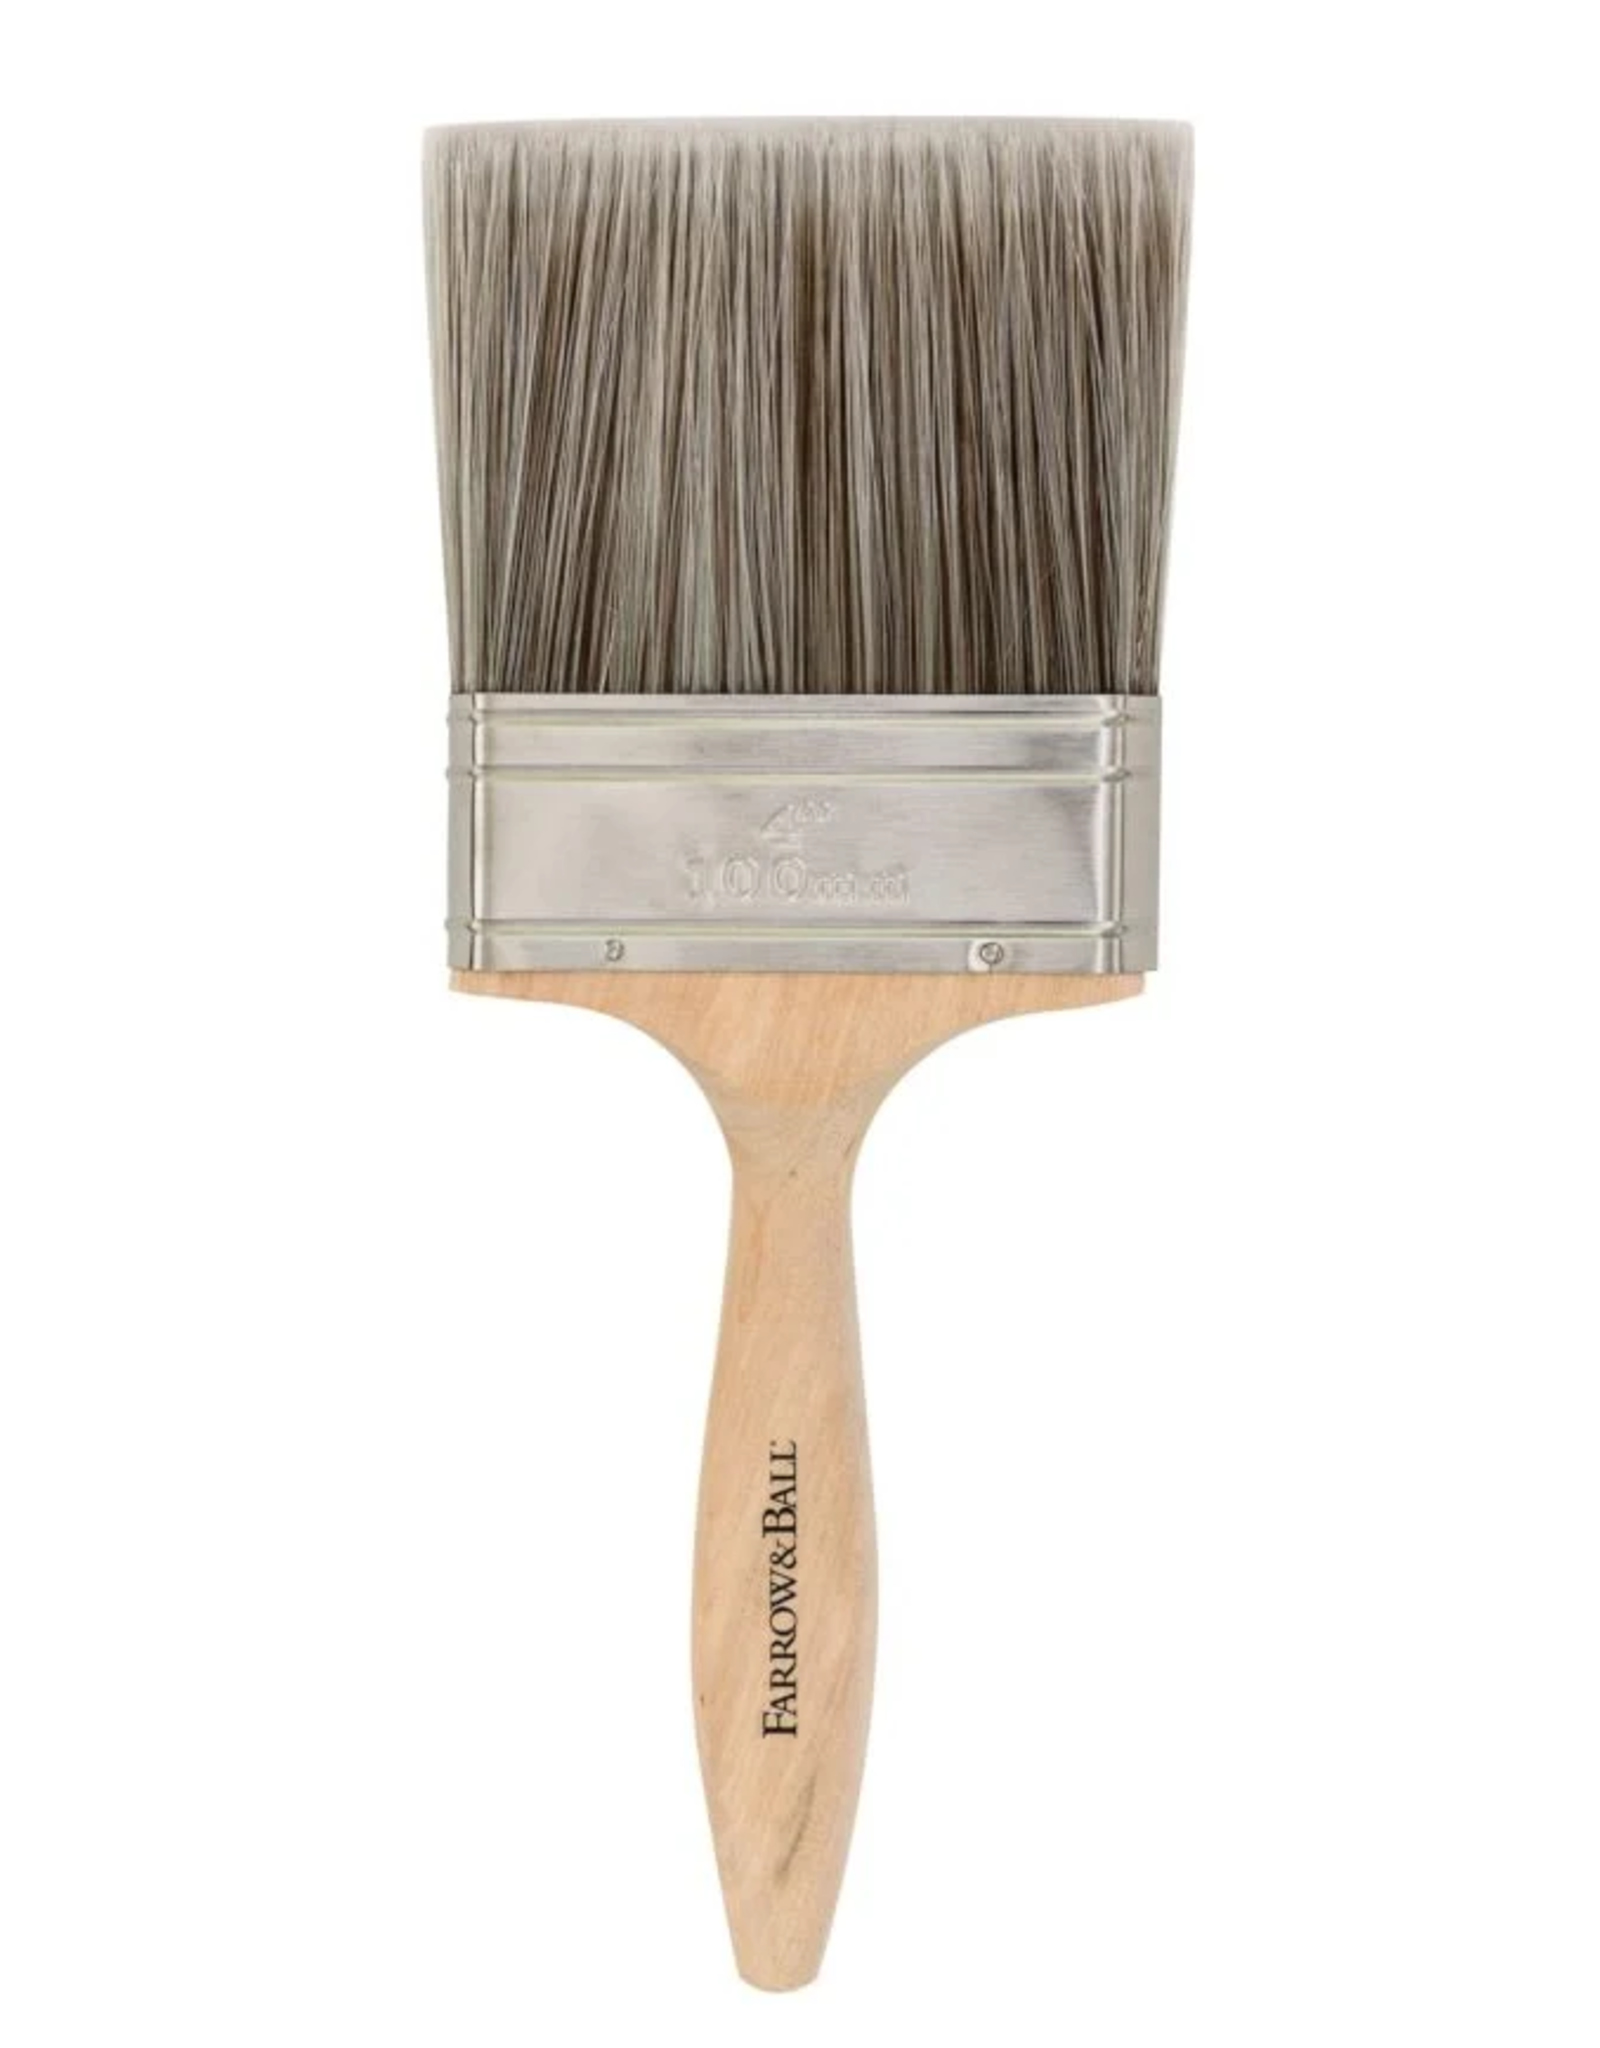 "Farrow and Ball 4"" F&B Paint Brush"